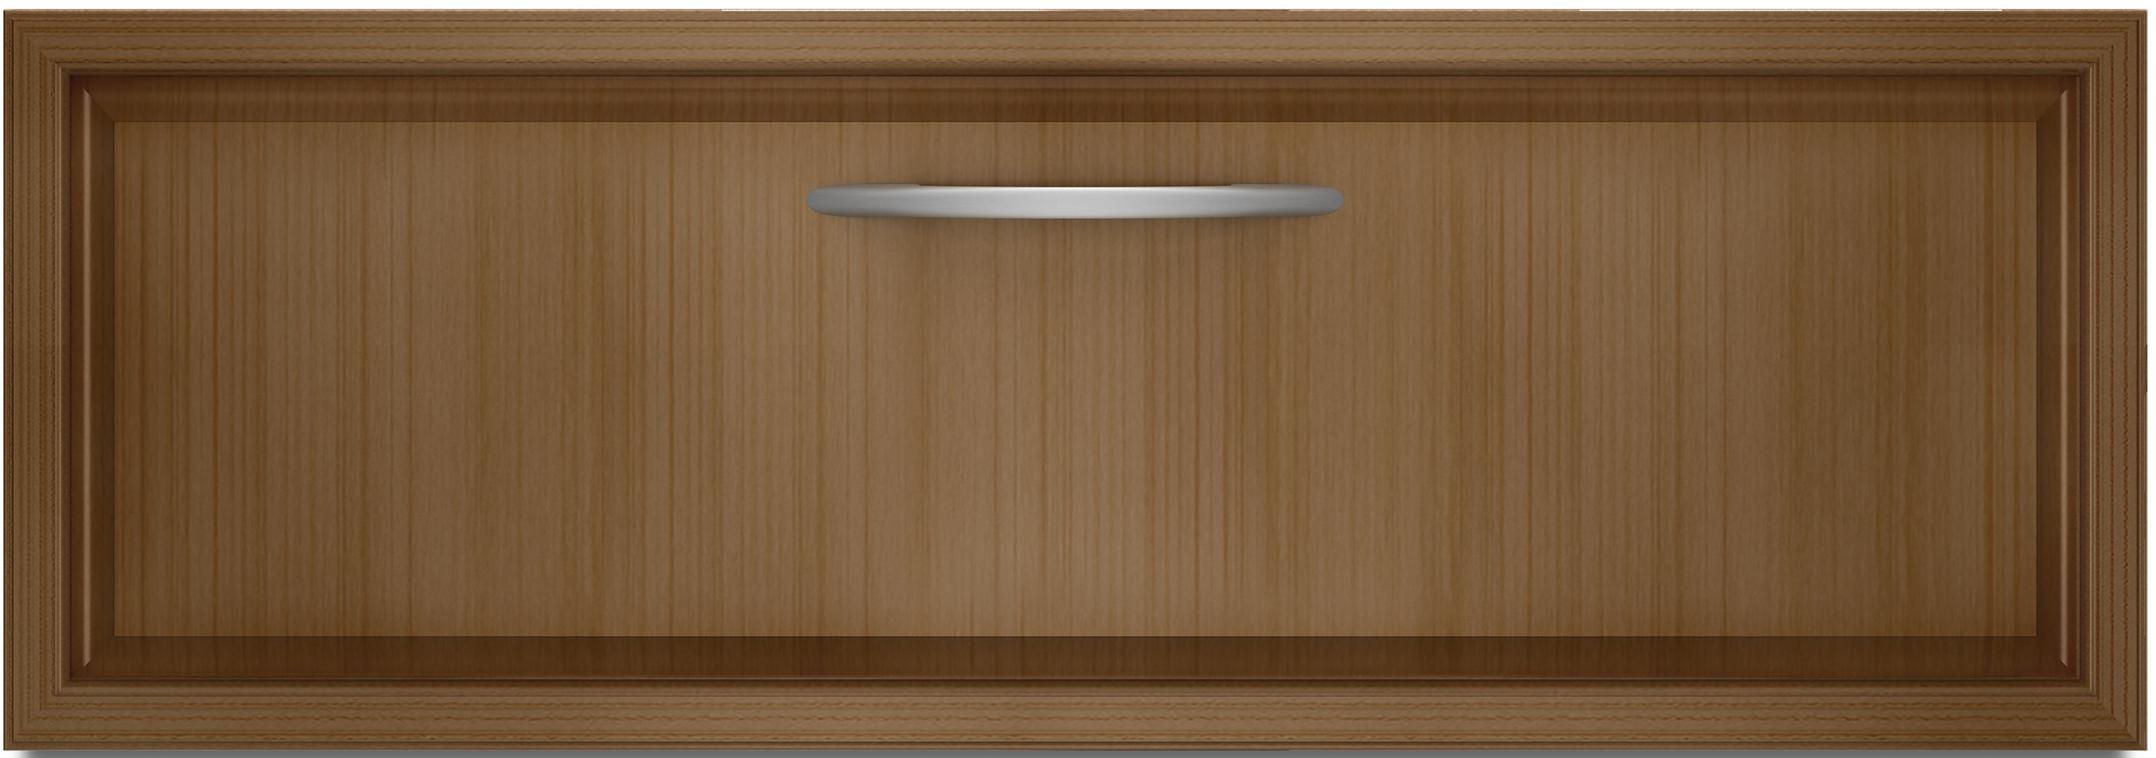 "Warming Drawer 30"" Electric Warming Drawer by KitchenAid at Furniture and ApplianceMart"